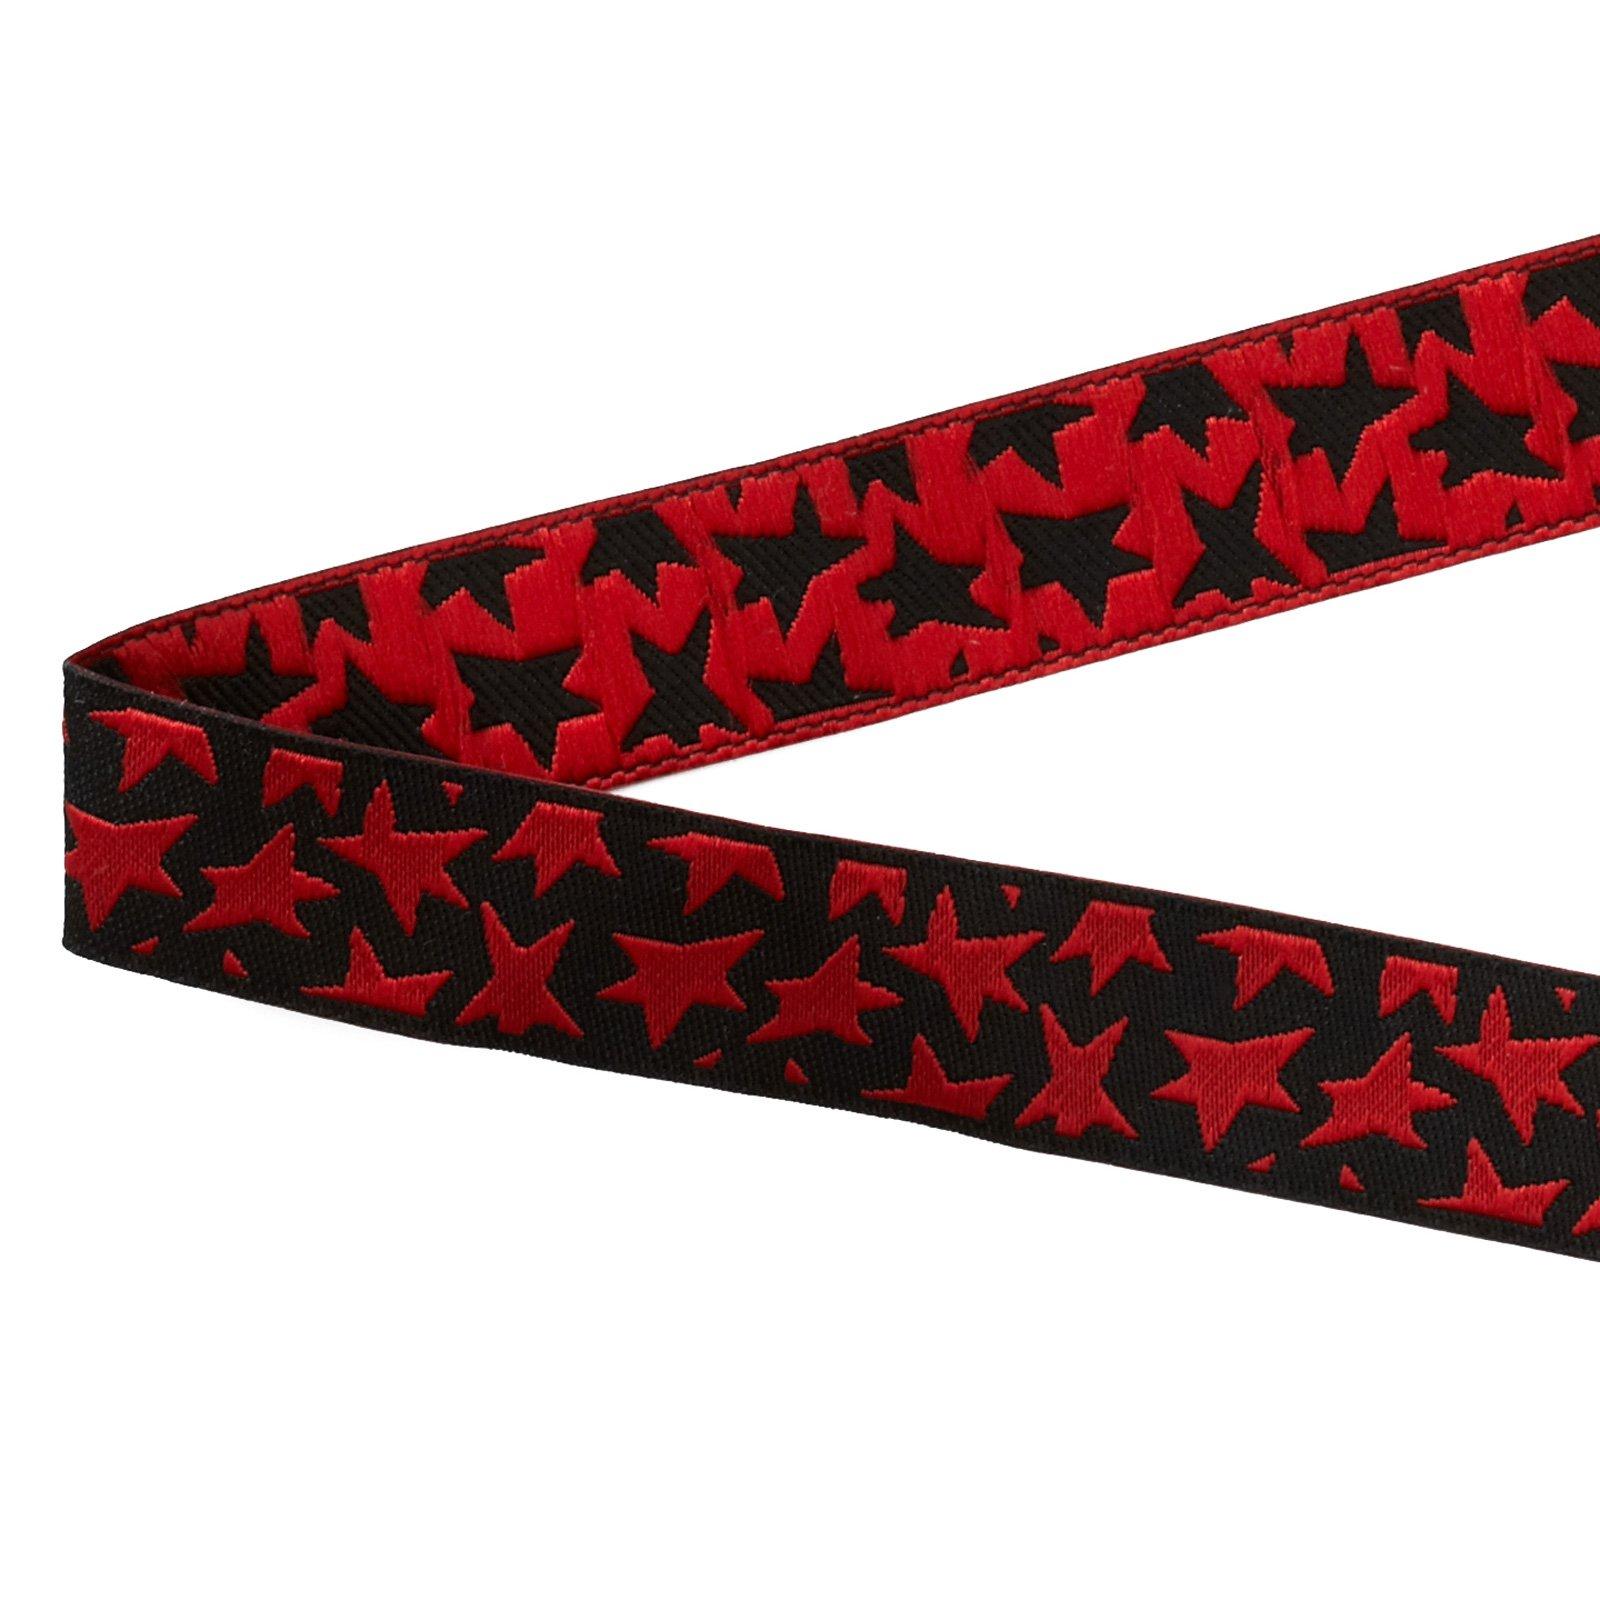 Luella Doss Ribbon red star on black